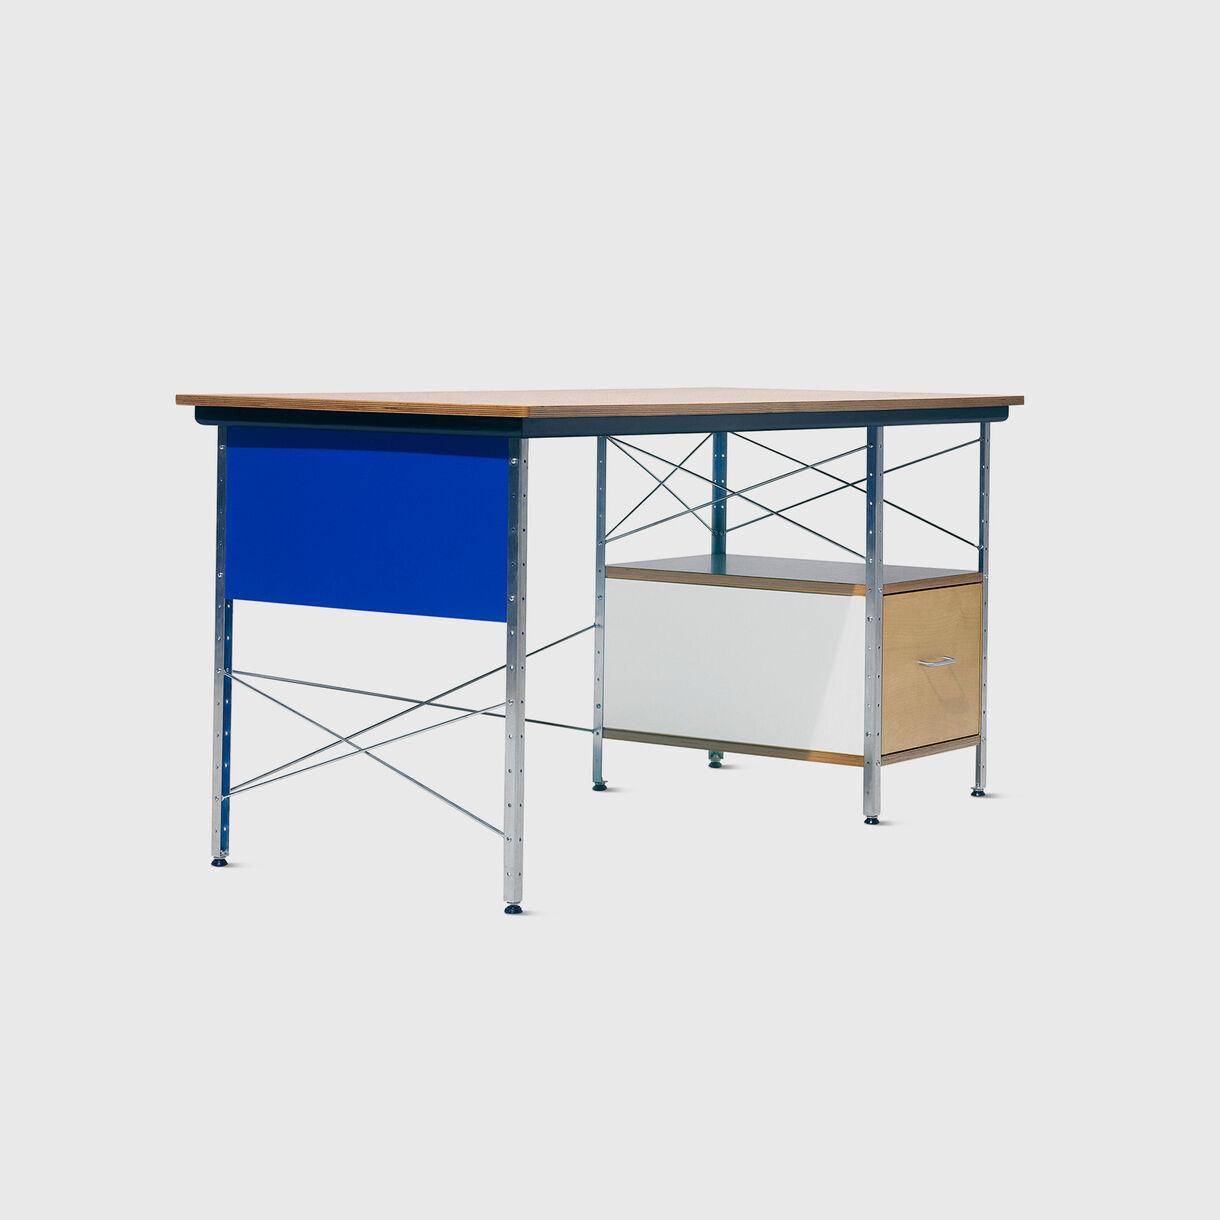 Eames Desk, Multi & Zinc Frame, RH Drawer